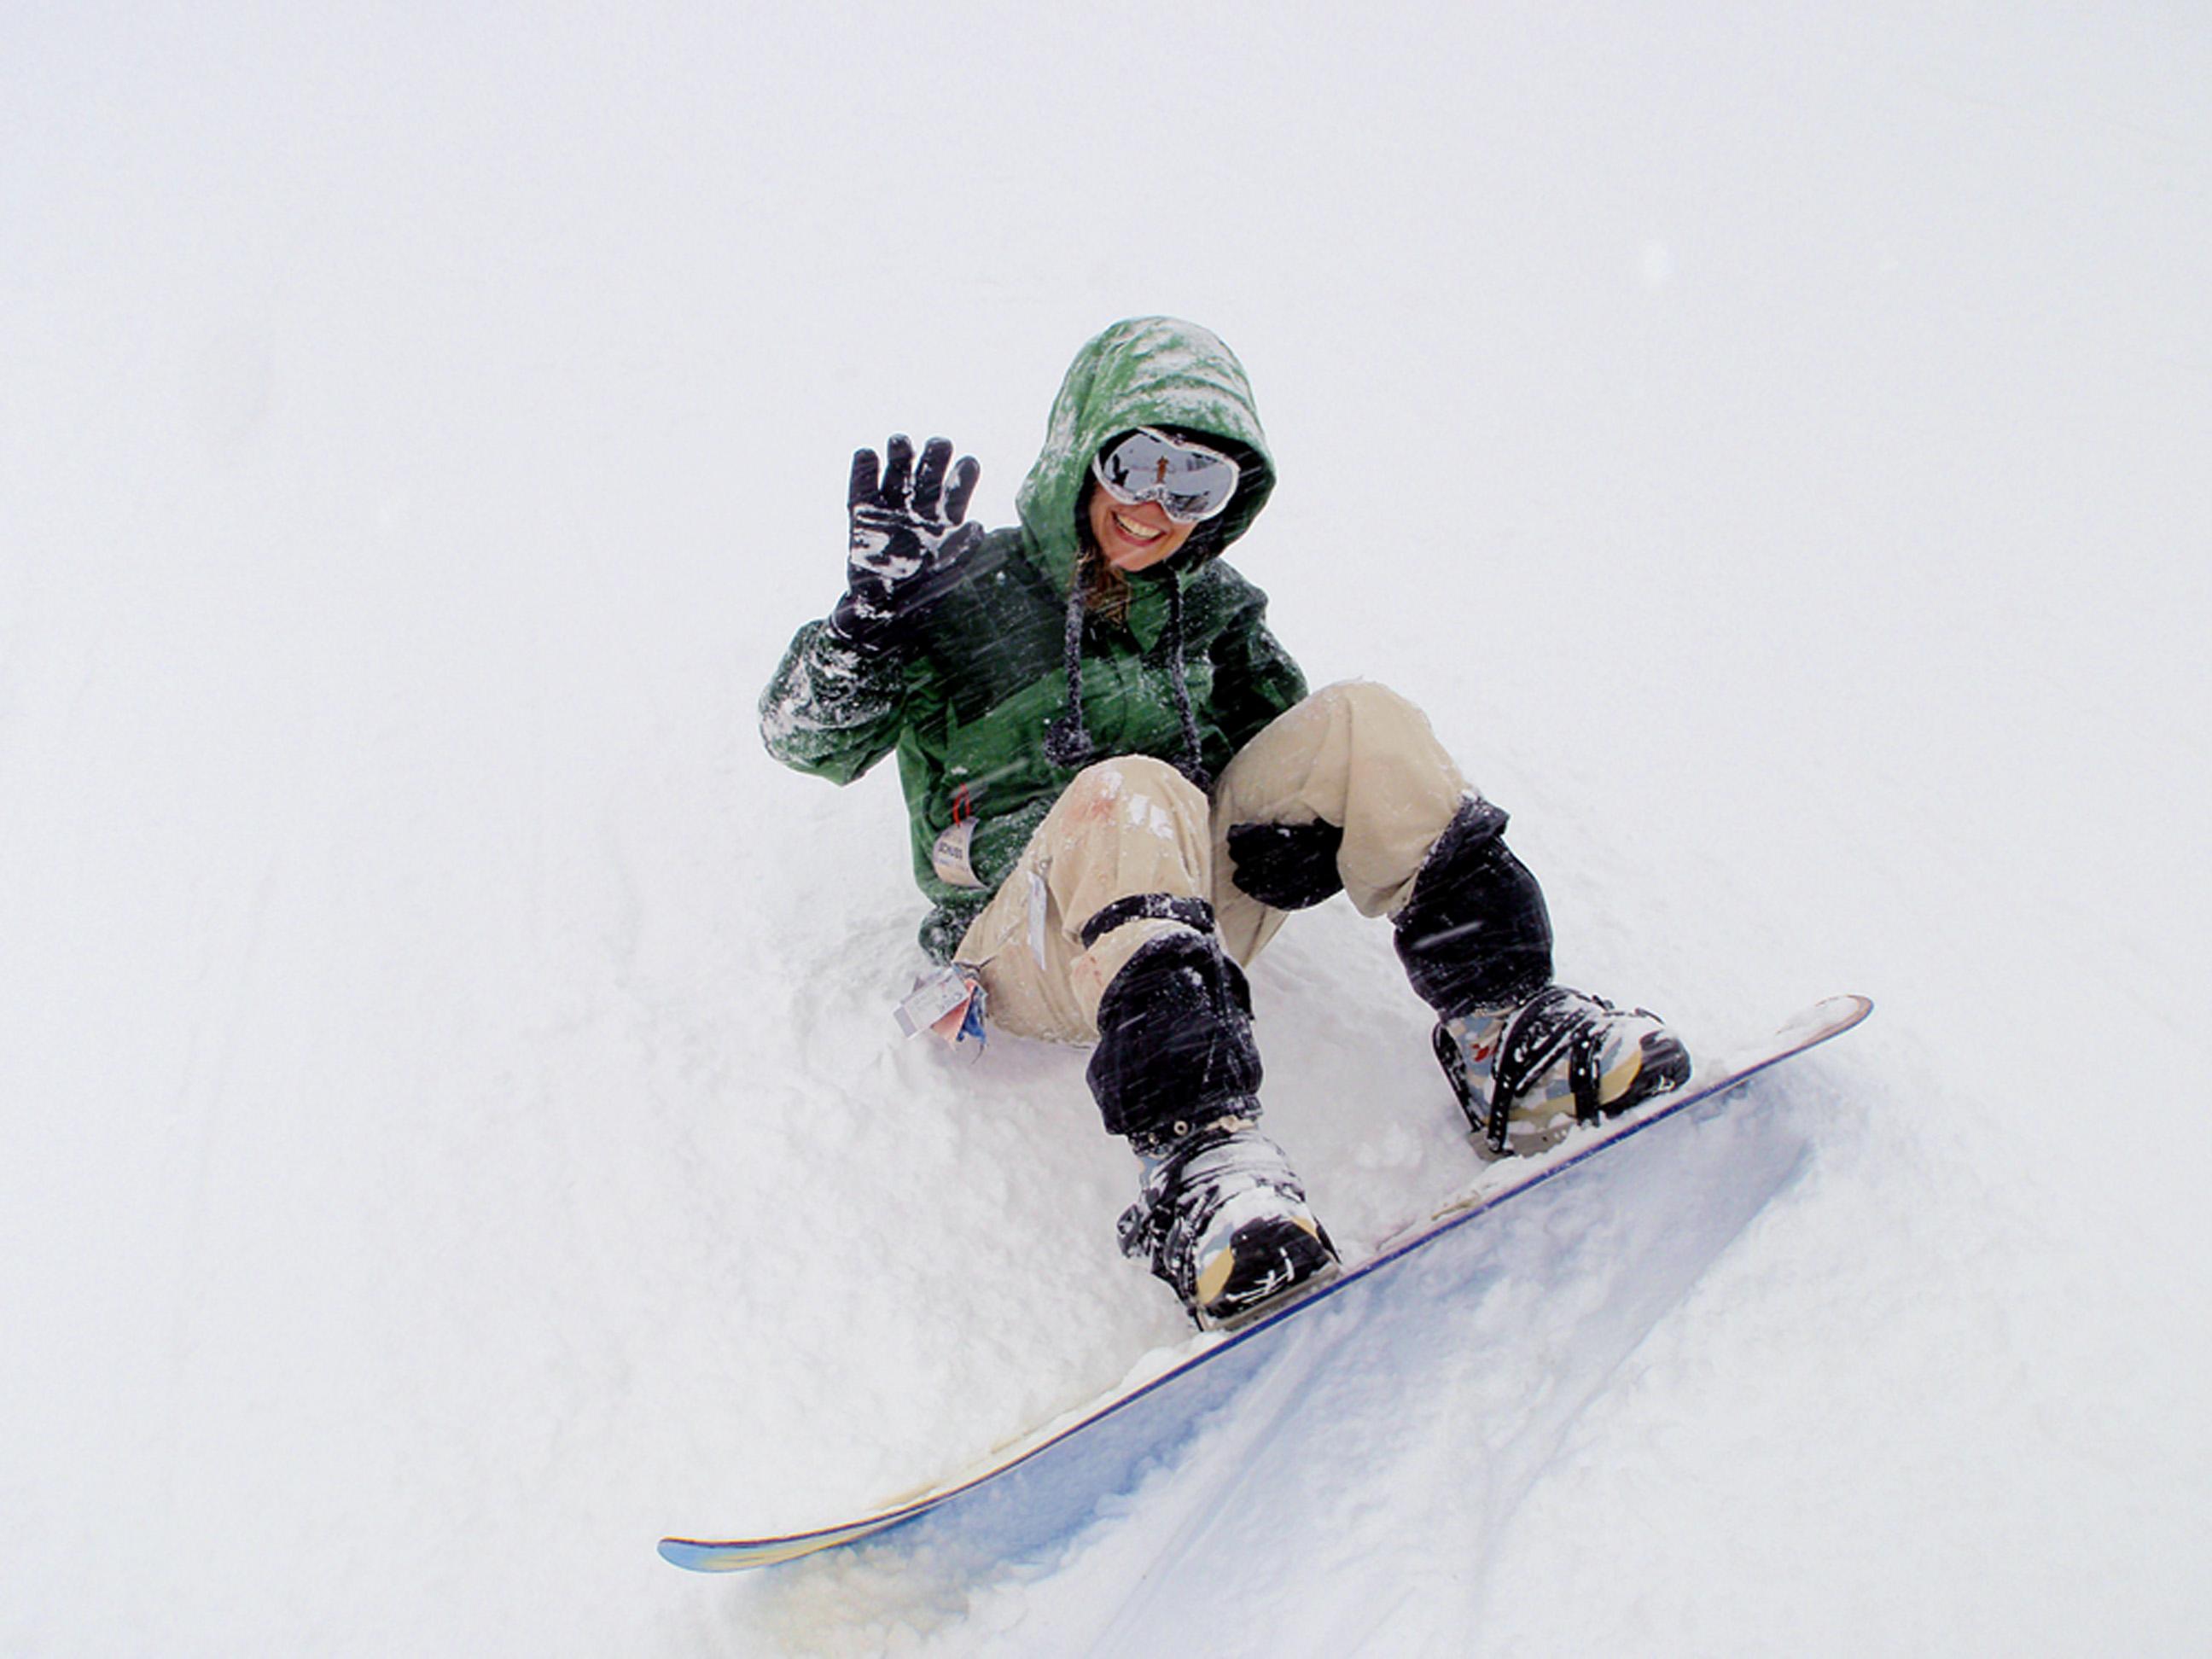 Fabiana se arrisca no snowboard, na Califórnia